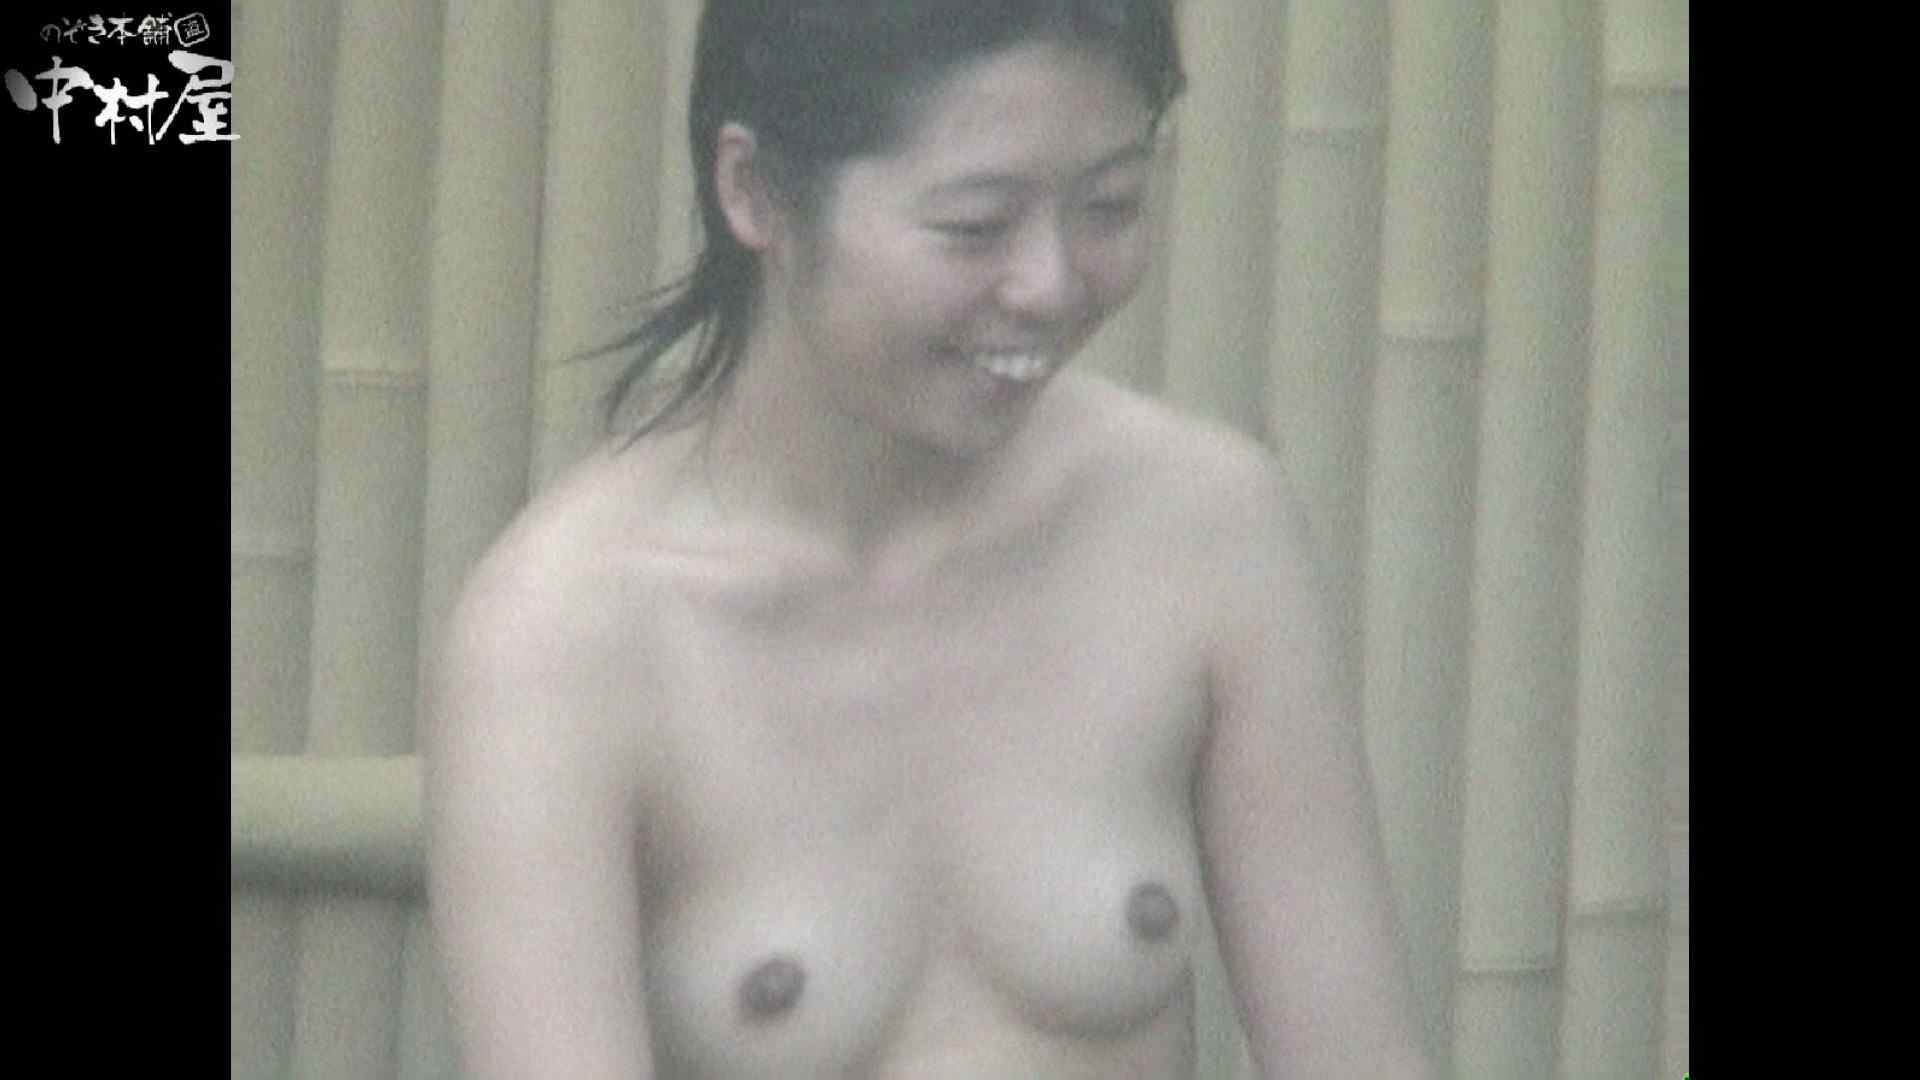 Aquaな露天風呂Vol.932 盗撮師作品   露天風呂突入  106pic 7